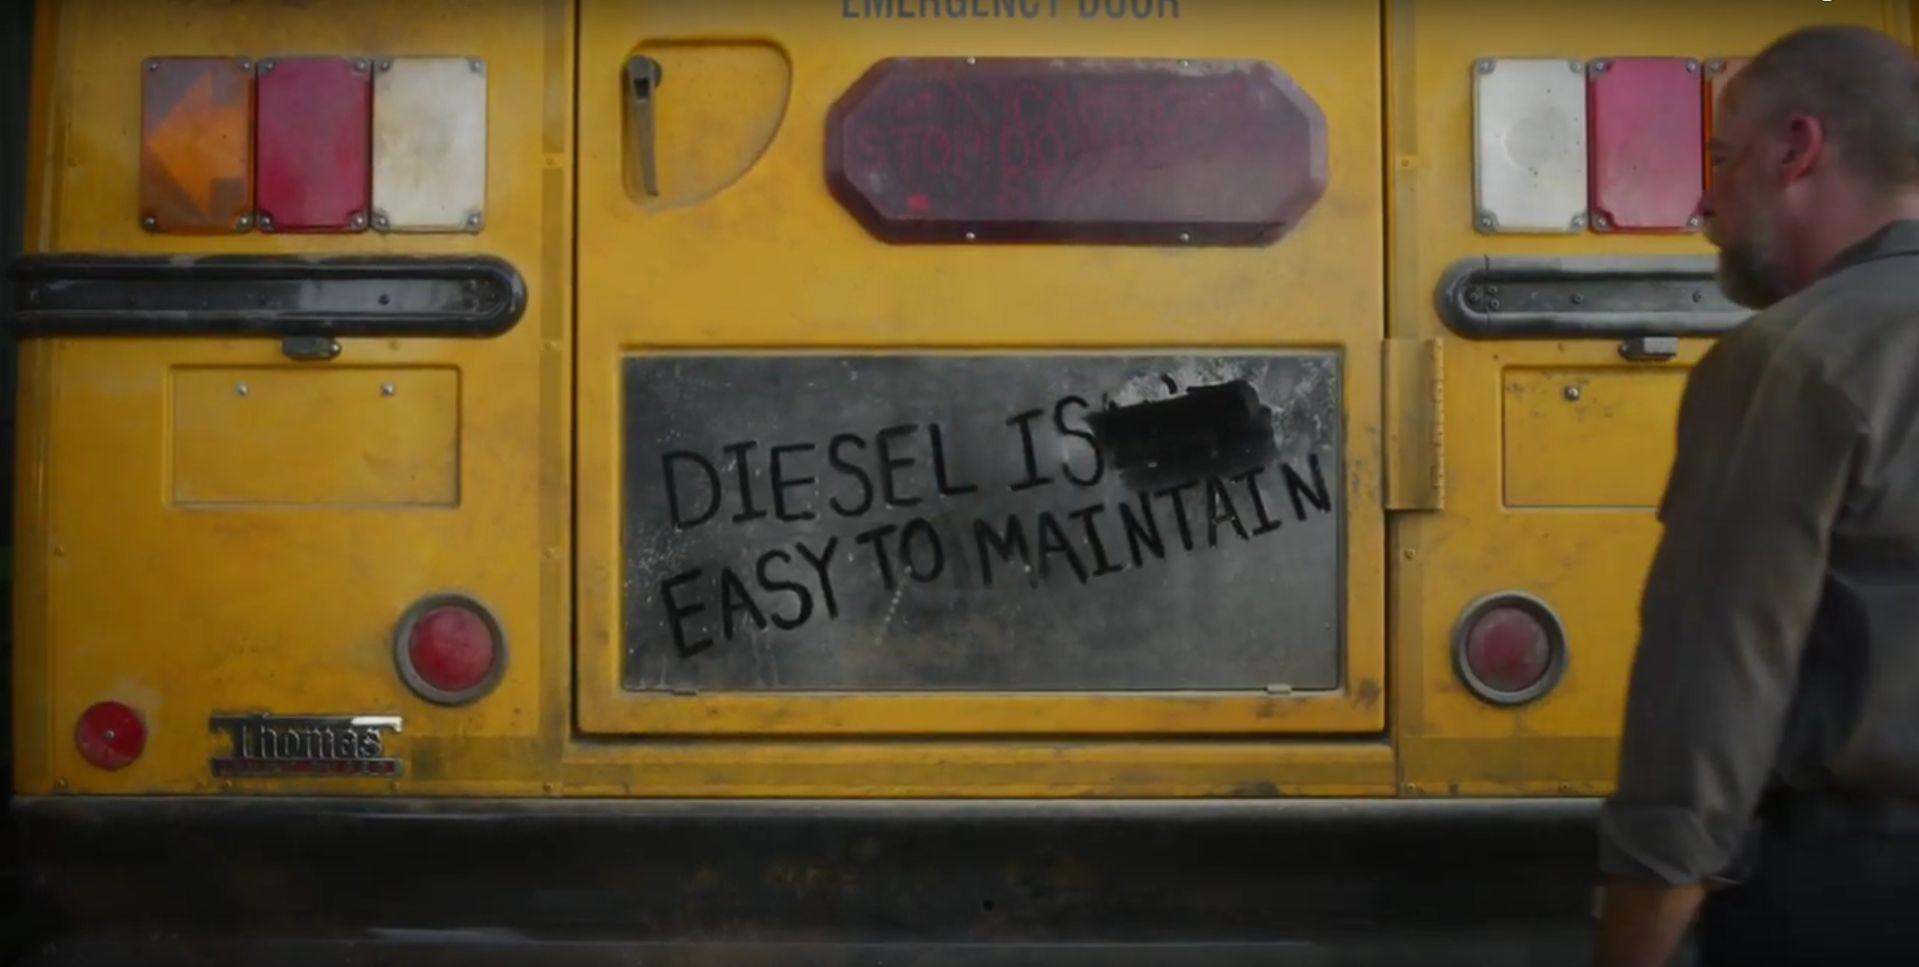 VIDEO: Thomas Built Buses - 'Diesel is Easy to Maintain'